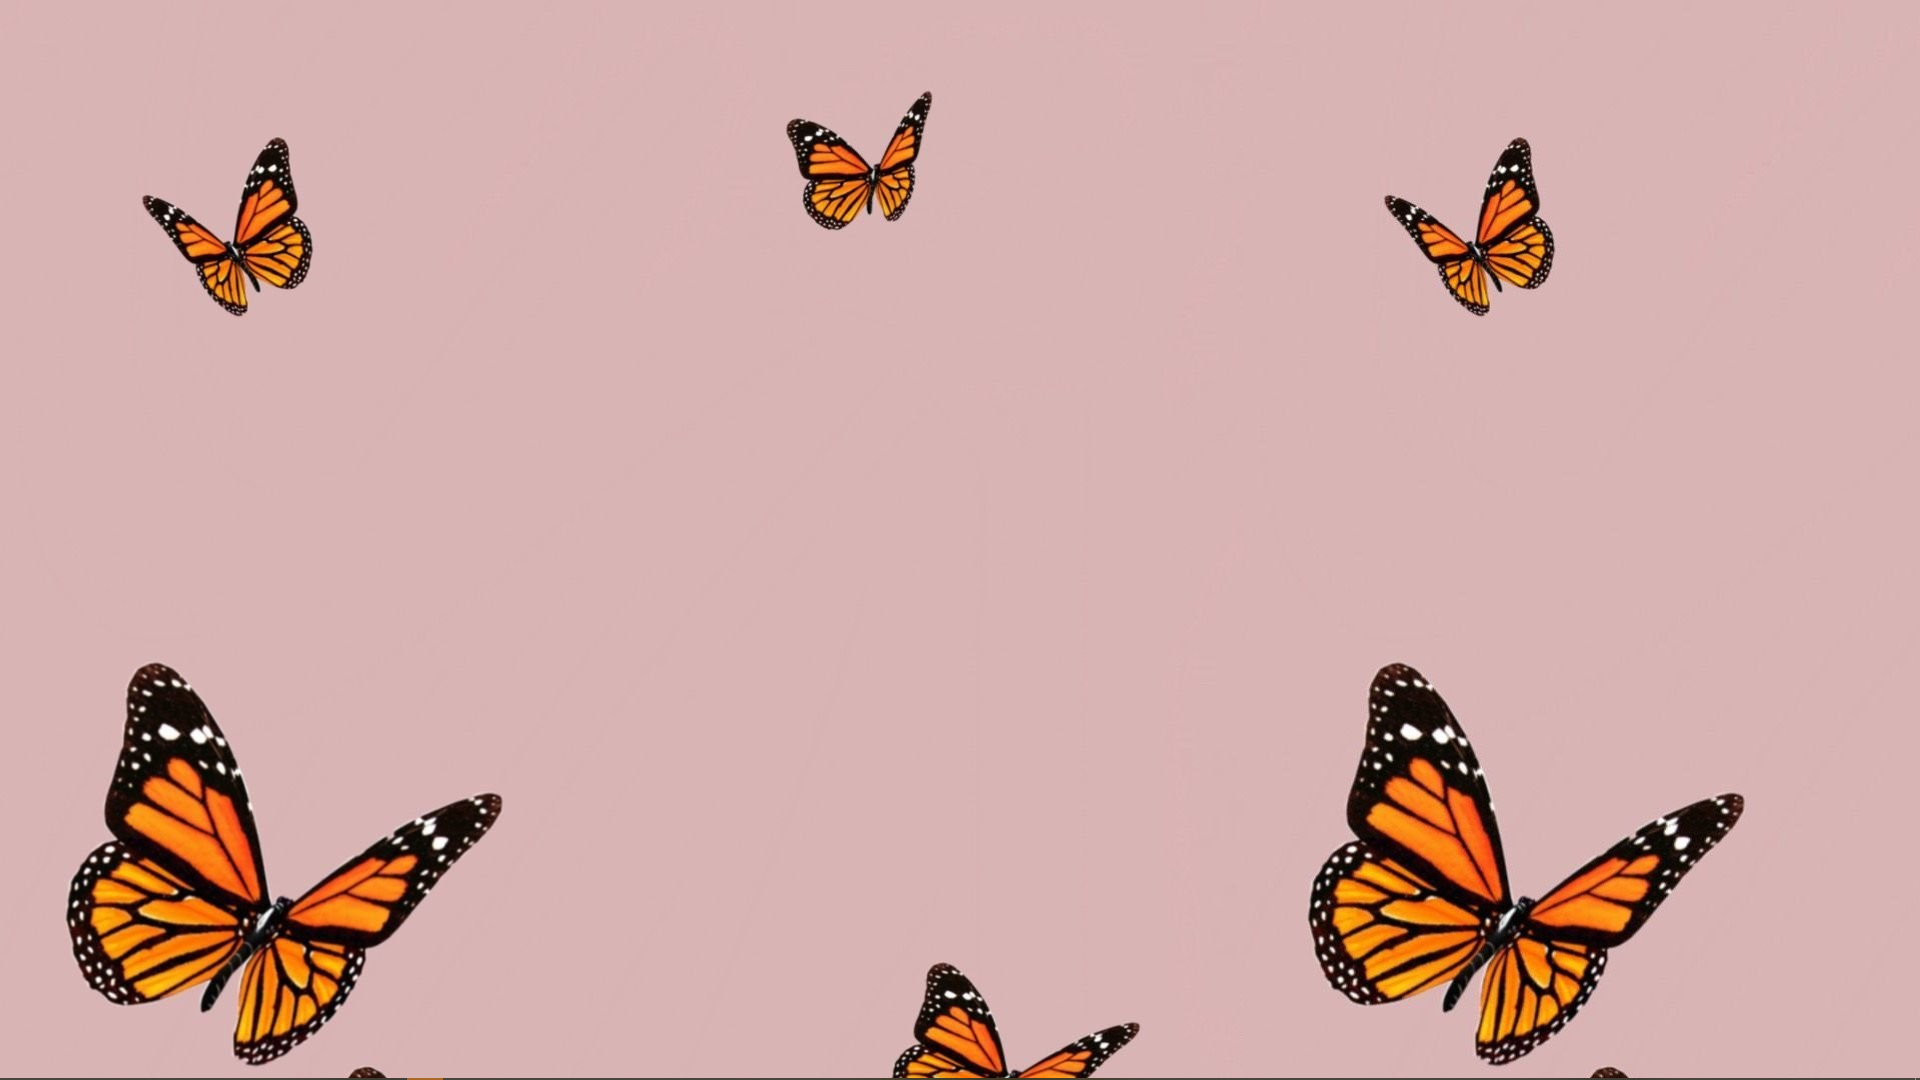 Aesthetic Butterfly Desktop Wallpapers - Wallpaper Cave